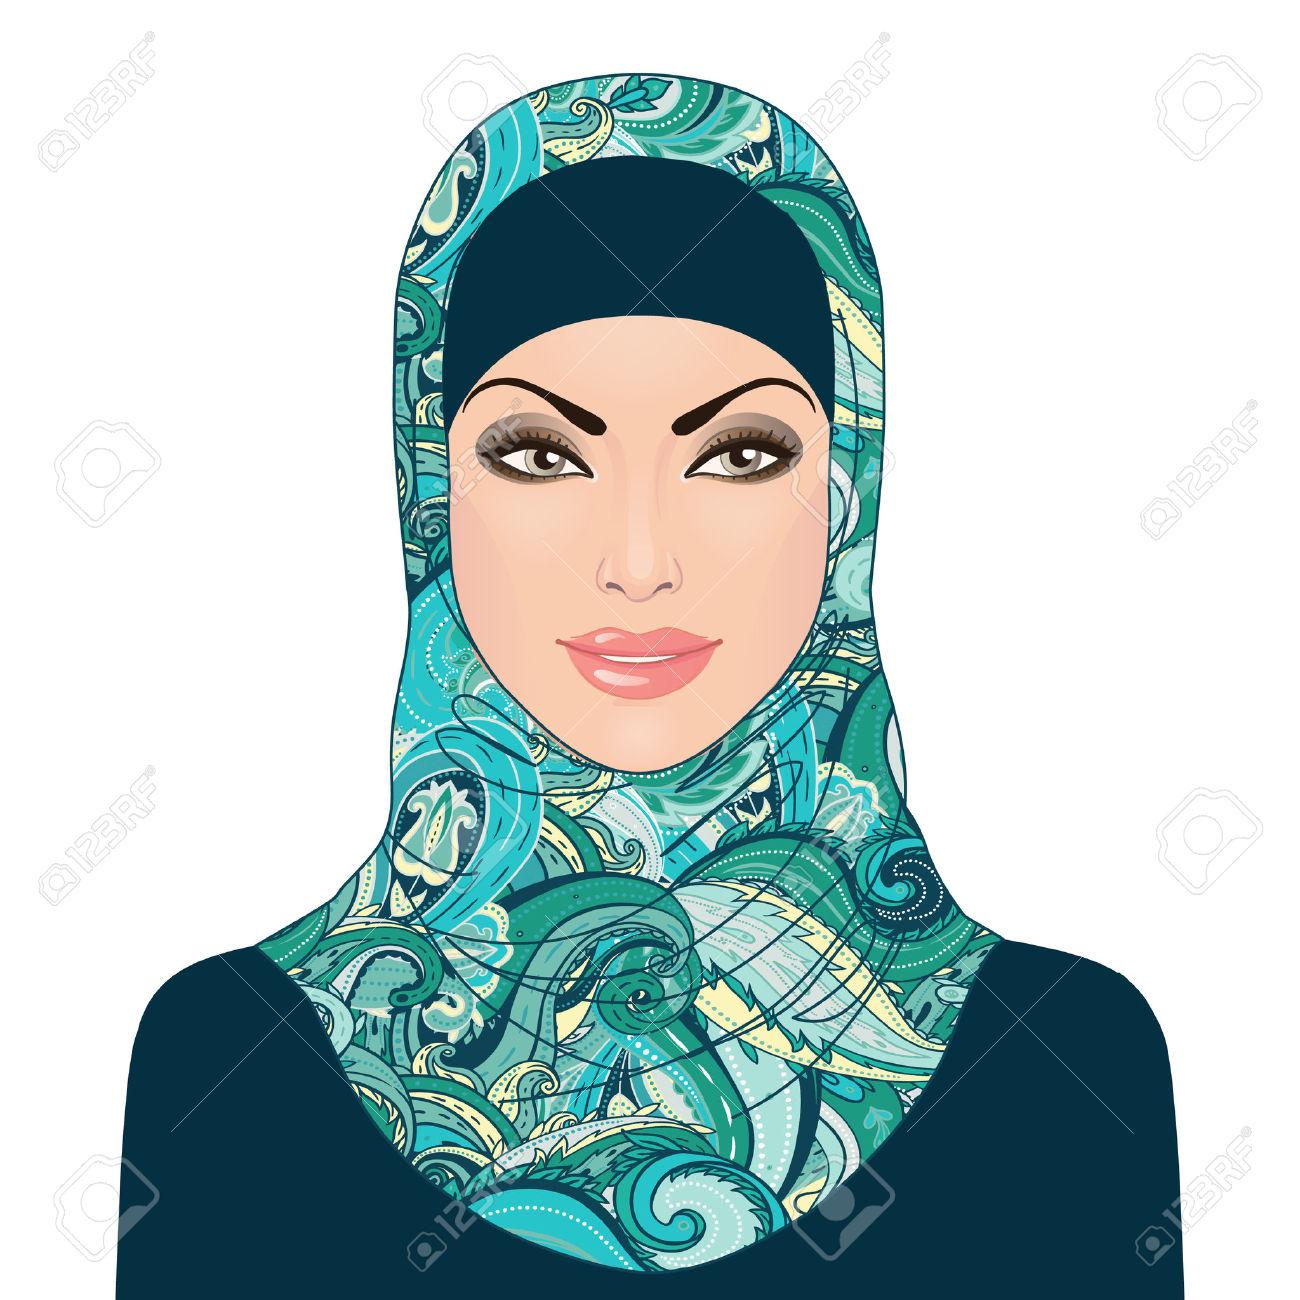 Women clipart pretty lady Woman Clipart Download Hijab Beautiful